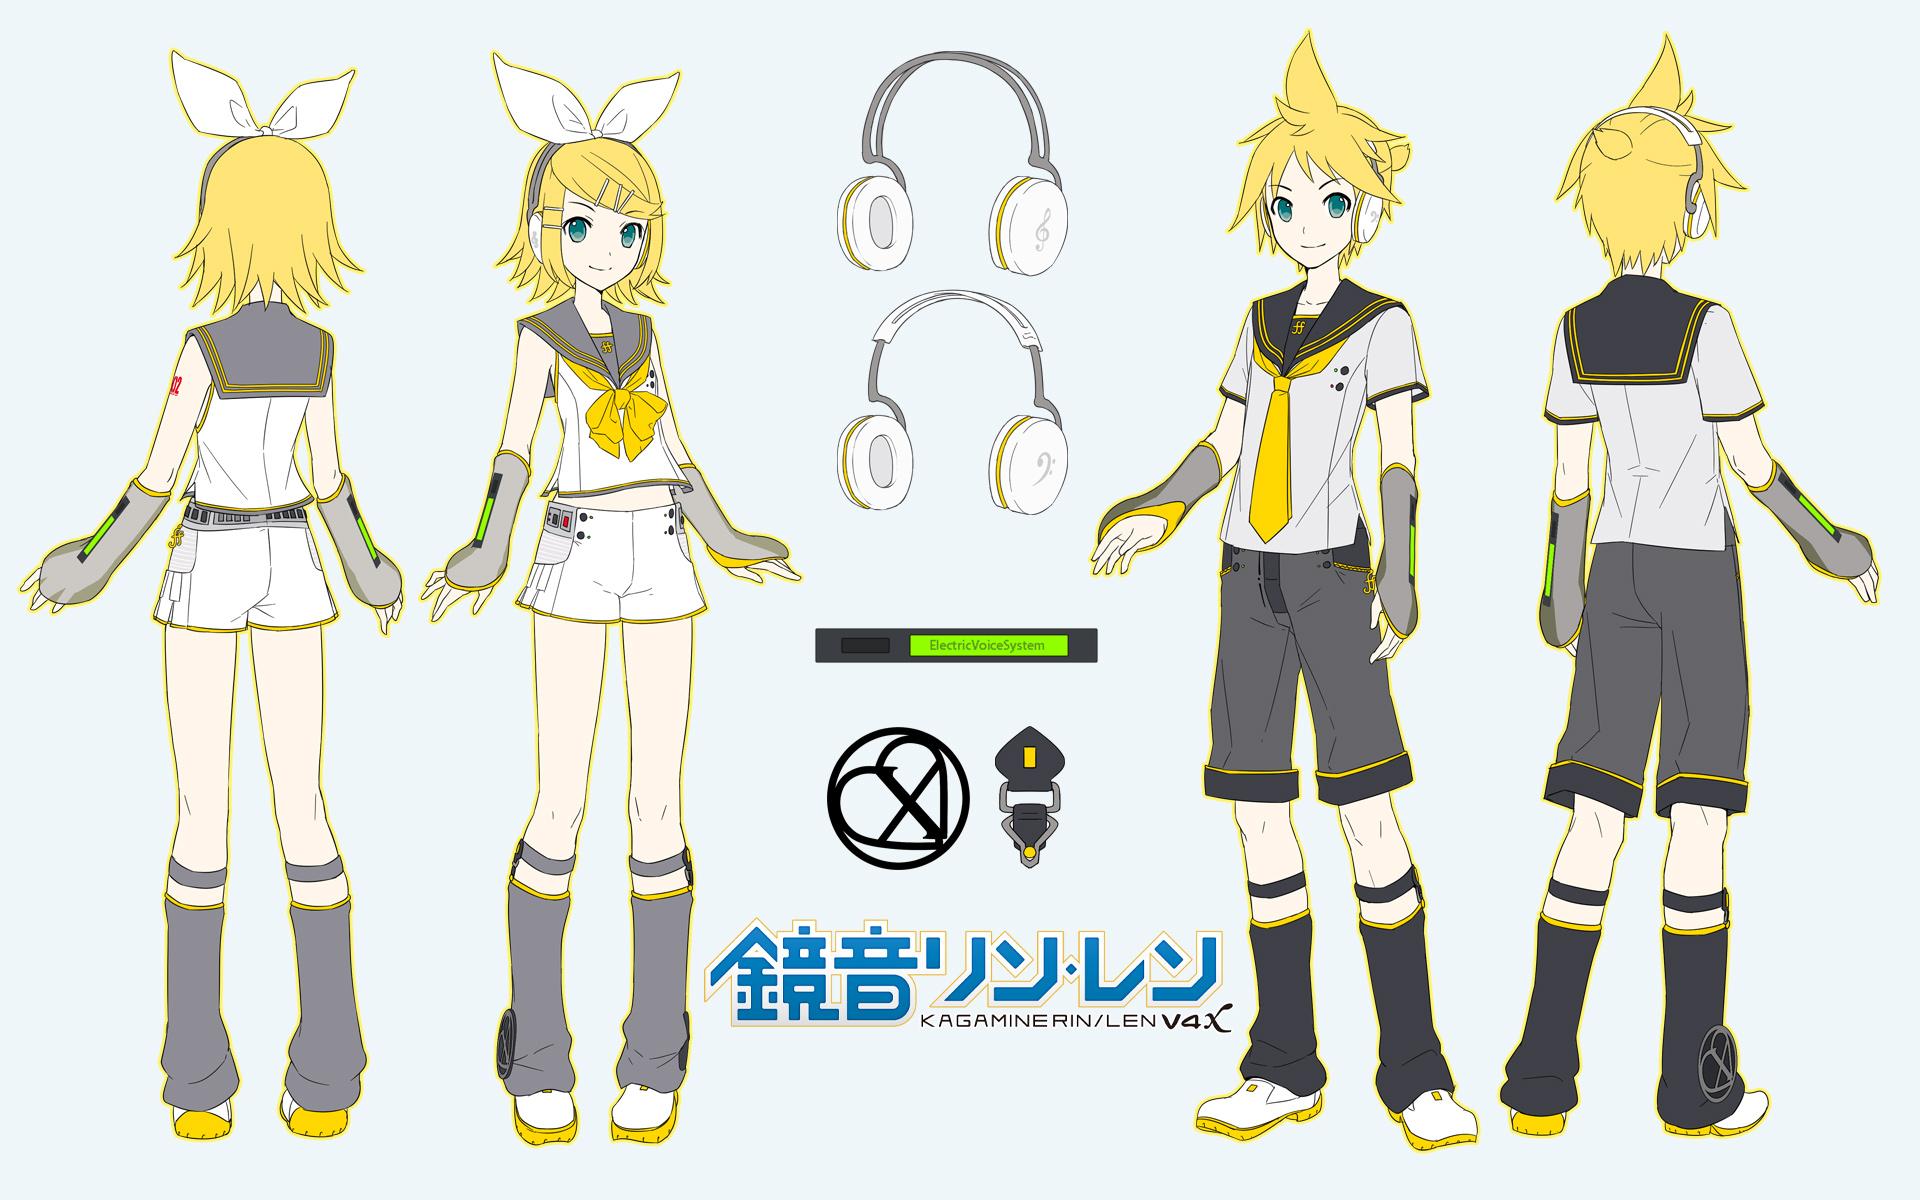 Serien Len image rin len v4x concept hq jpg vocaloid wiki fandom powered